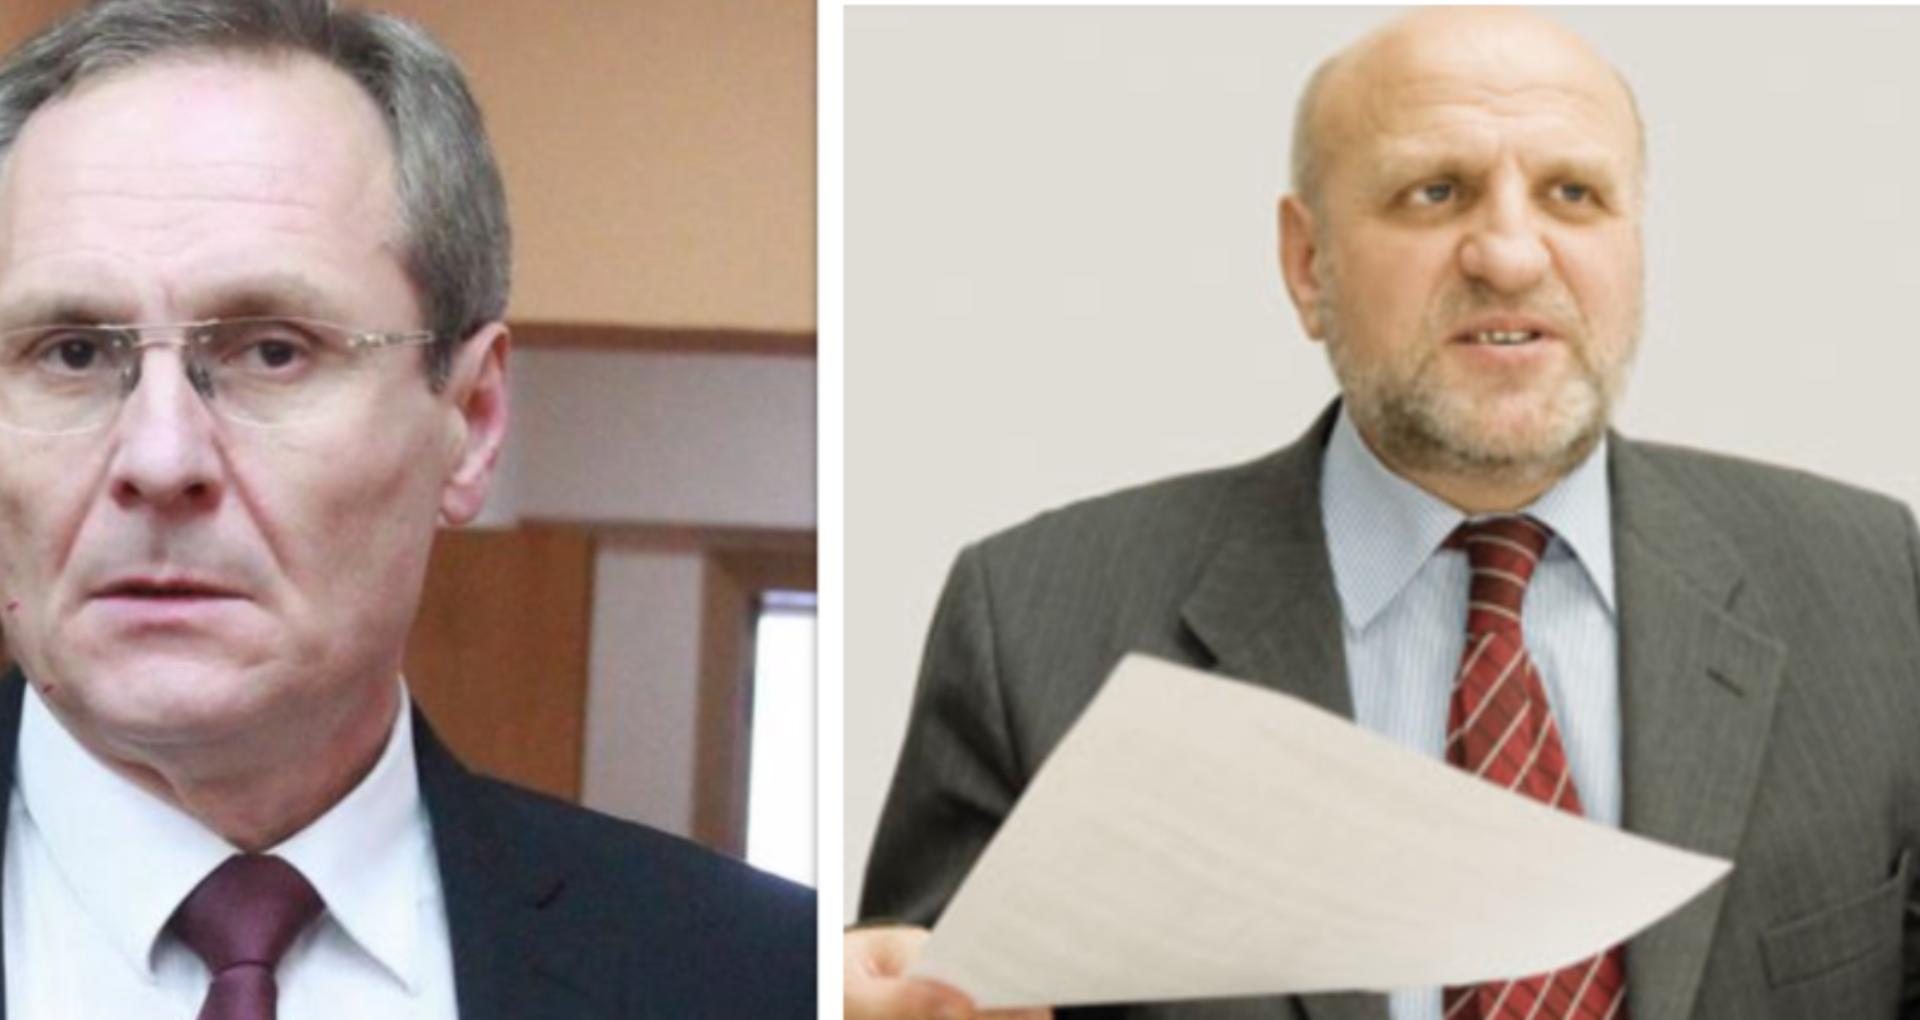 Moldova Has Two New Ambassadors to Russia and Estonia